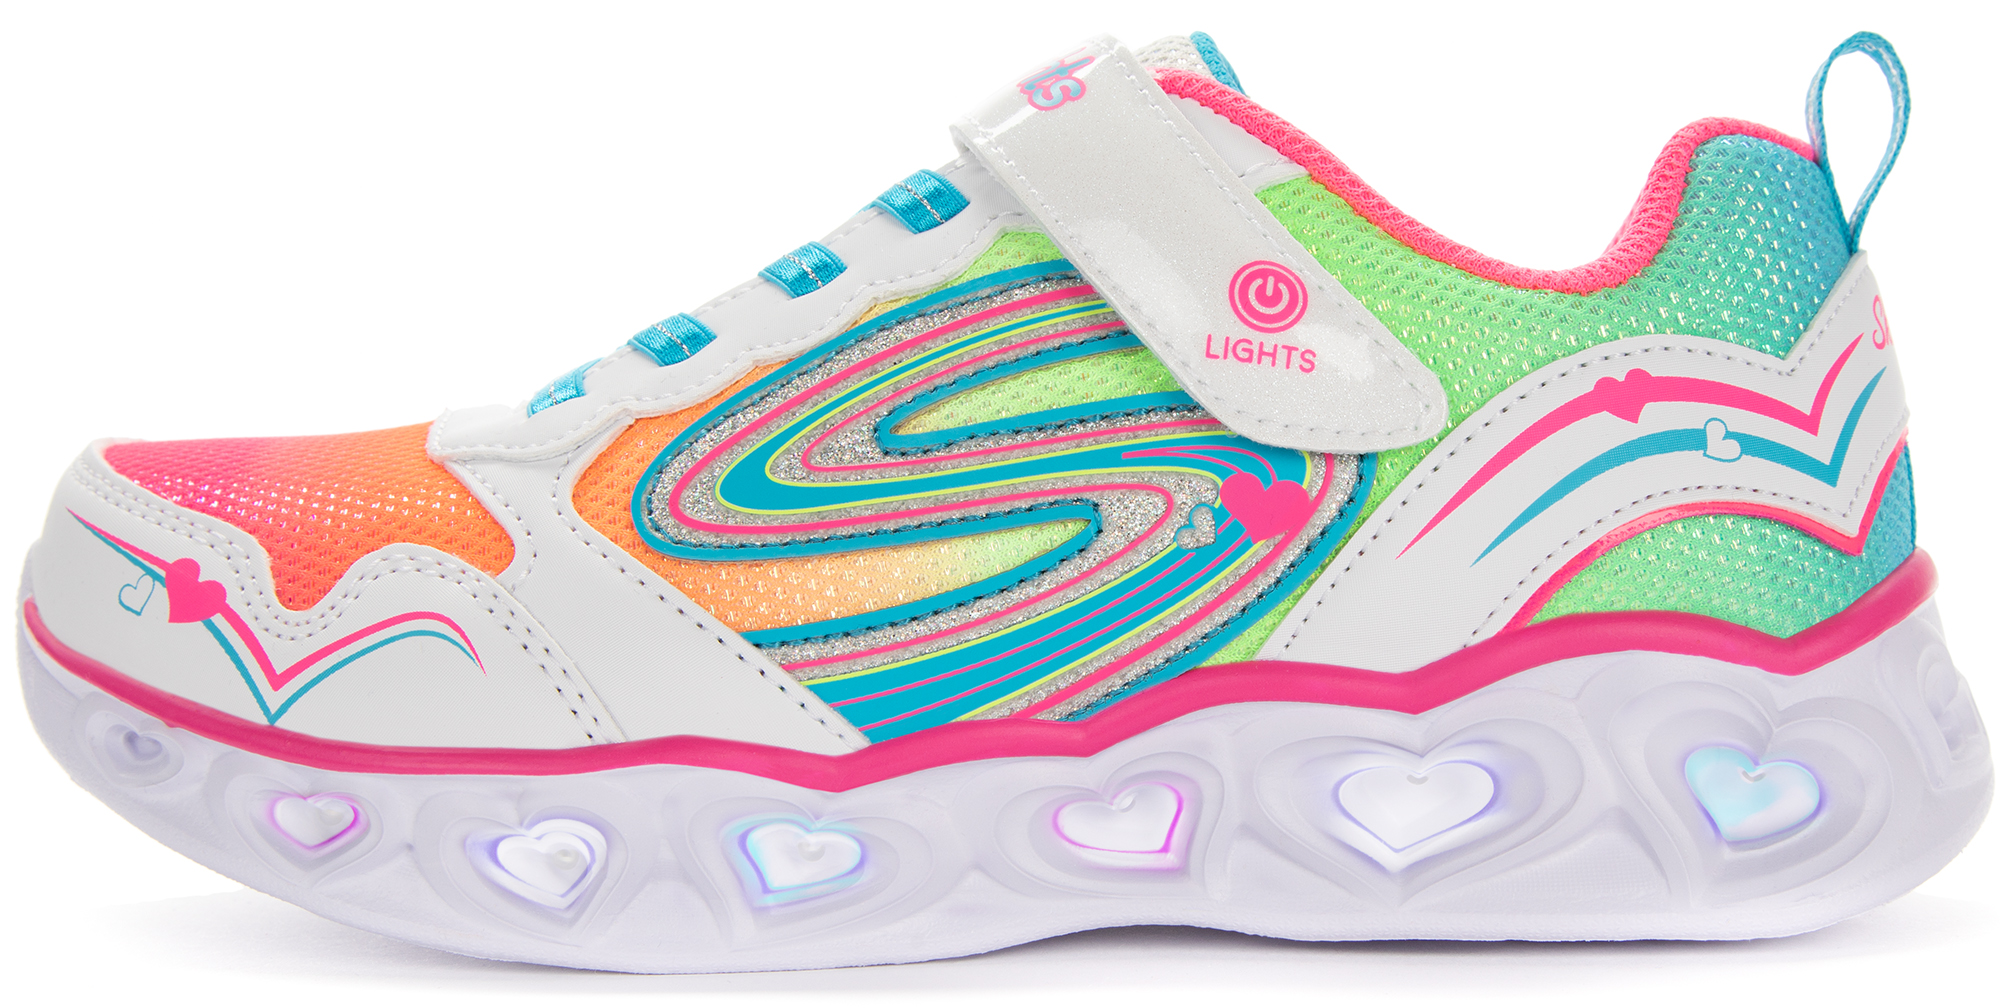 цена на Skechers Кроссовки для девочек Skechers Heart Lights Love Spark, размер 36